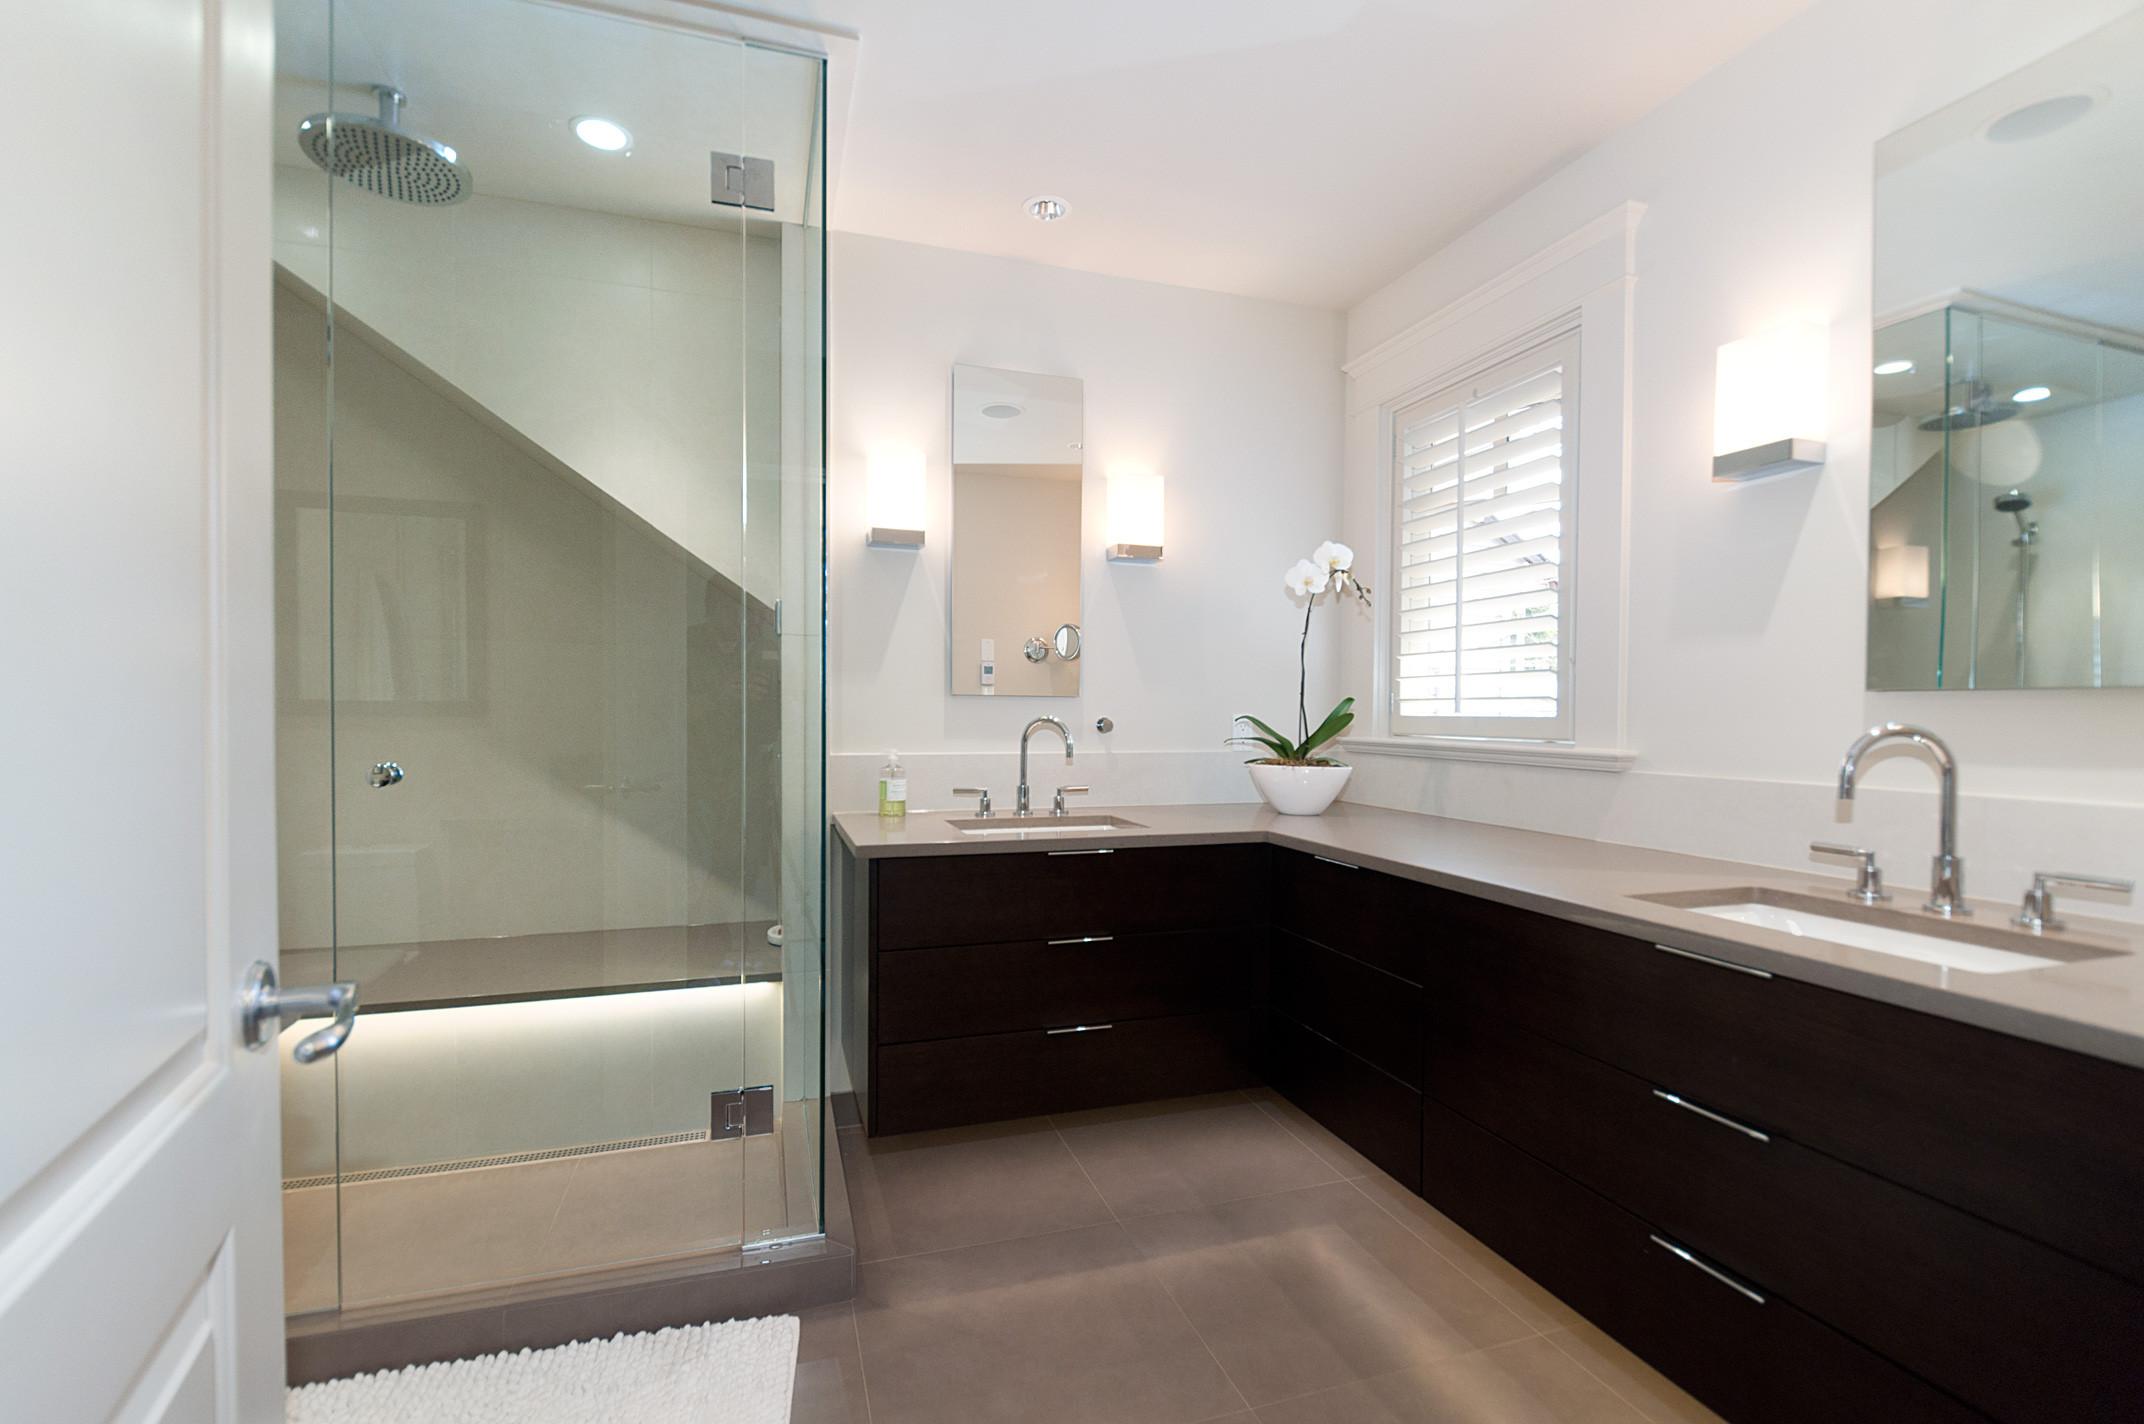 Modern bathroom design silver fern ventures inc for New bathroom designs 2012